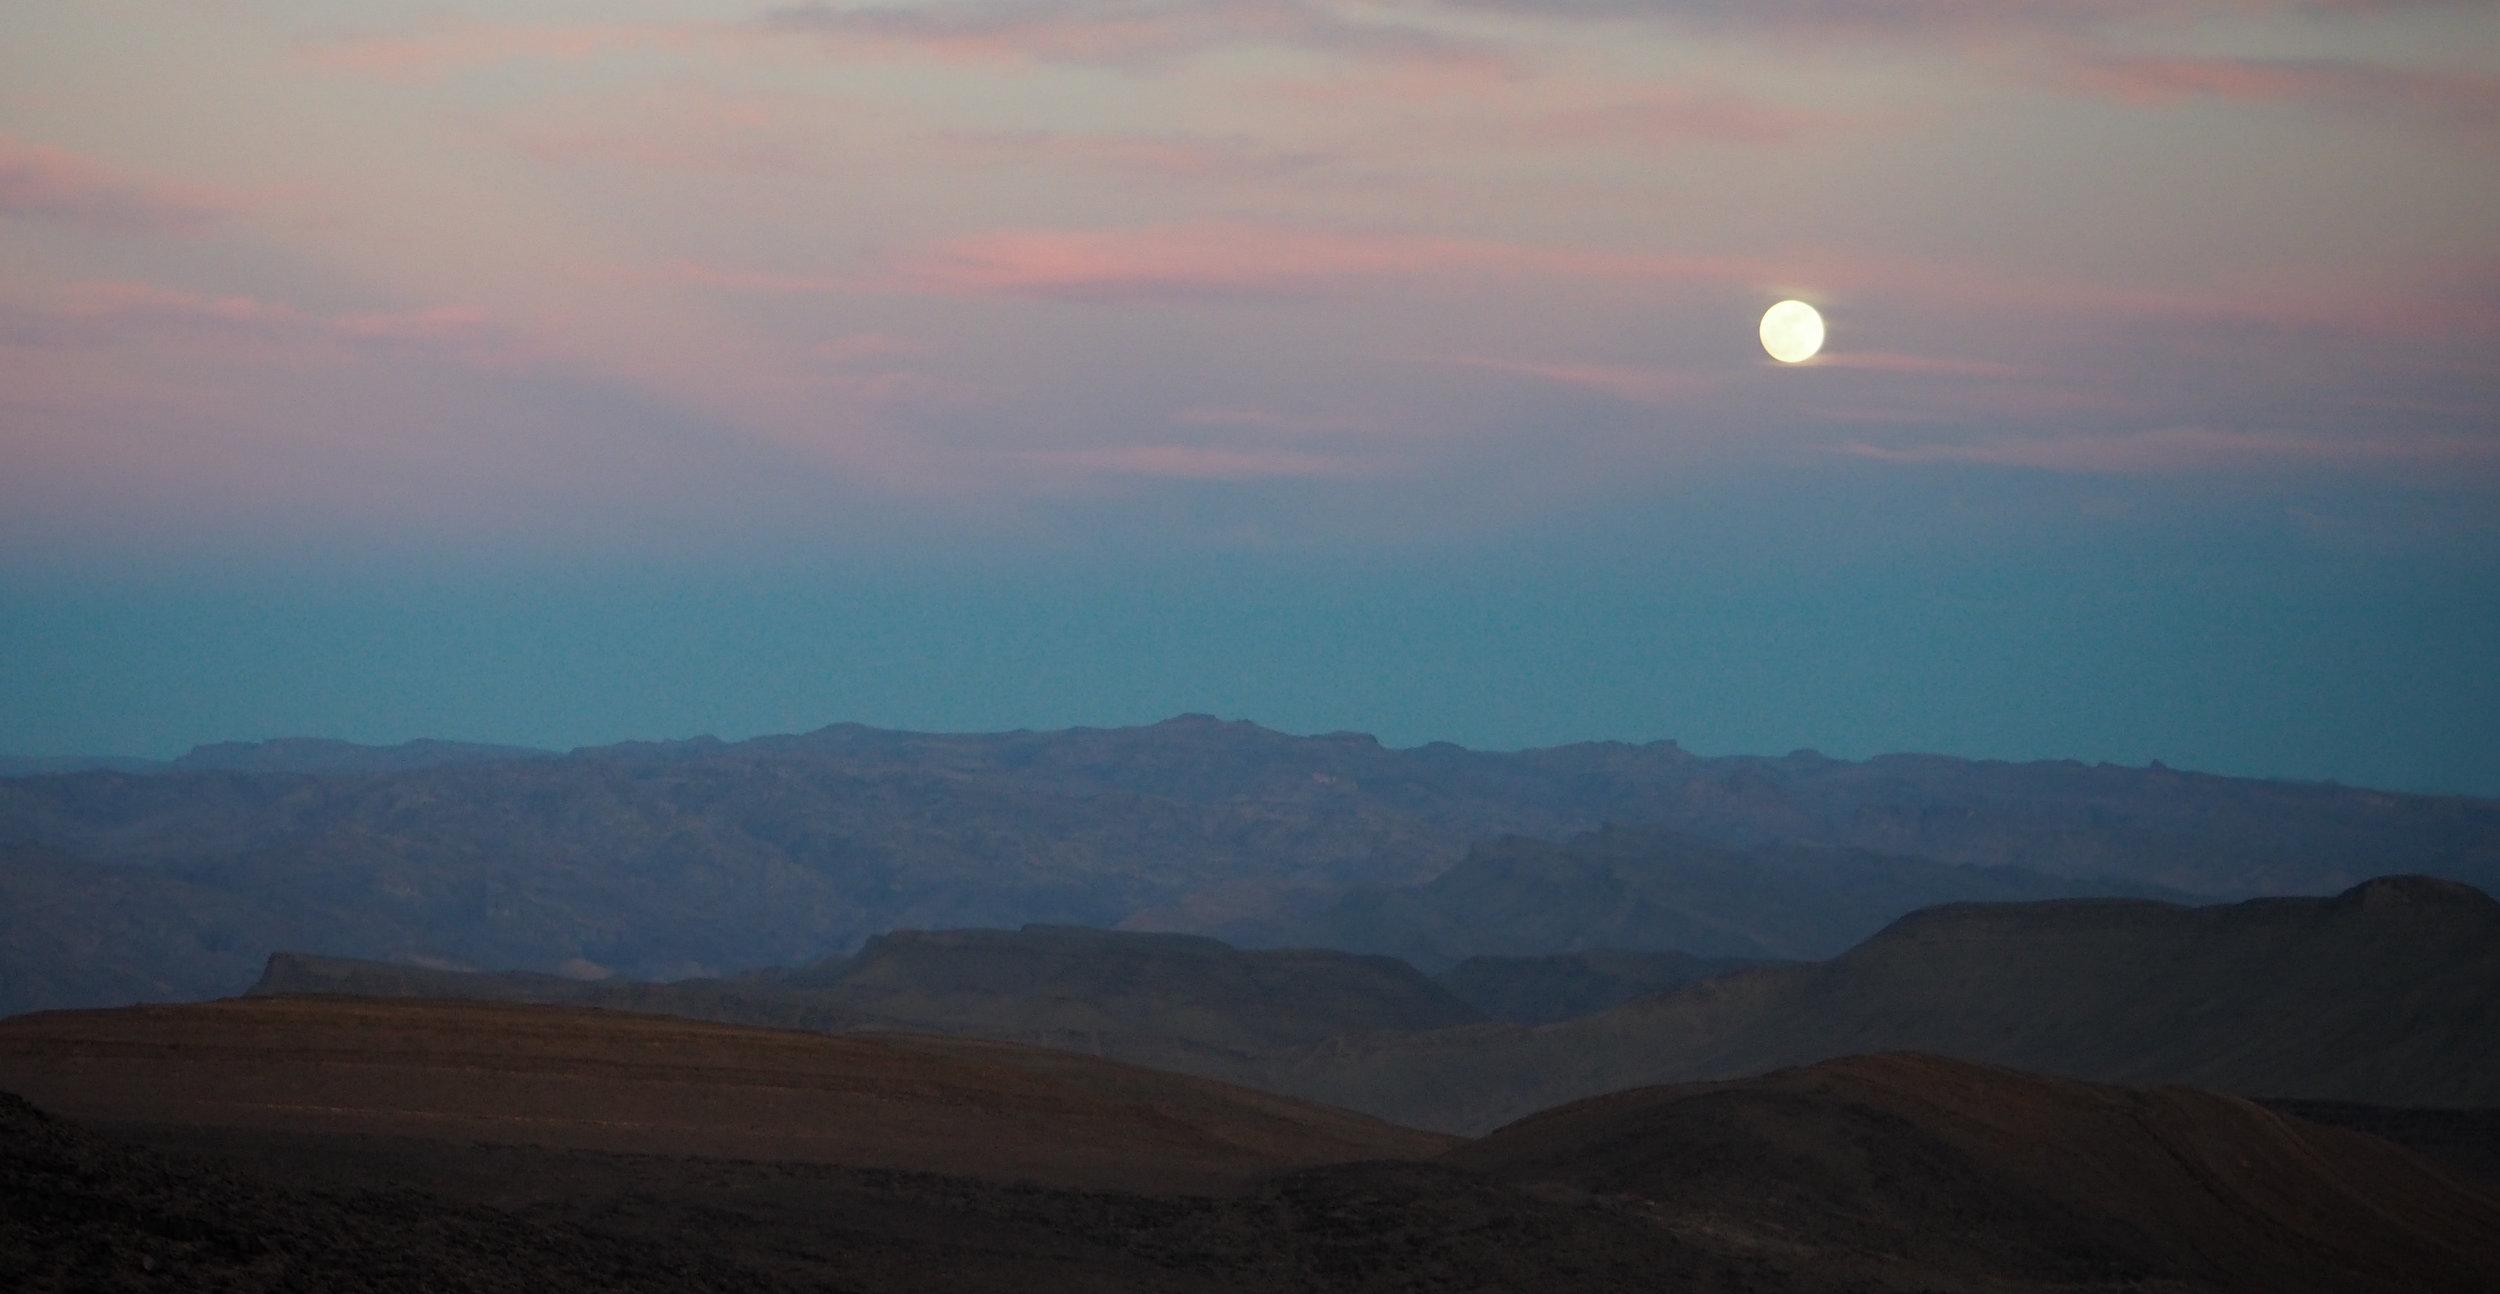 P1010408 moon sky crop 1.jpg